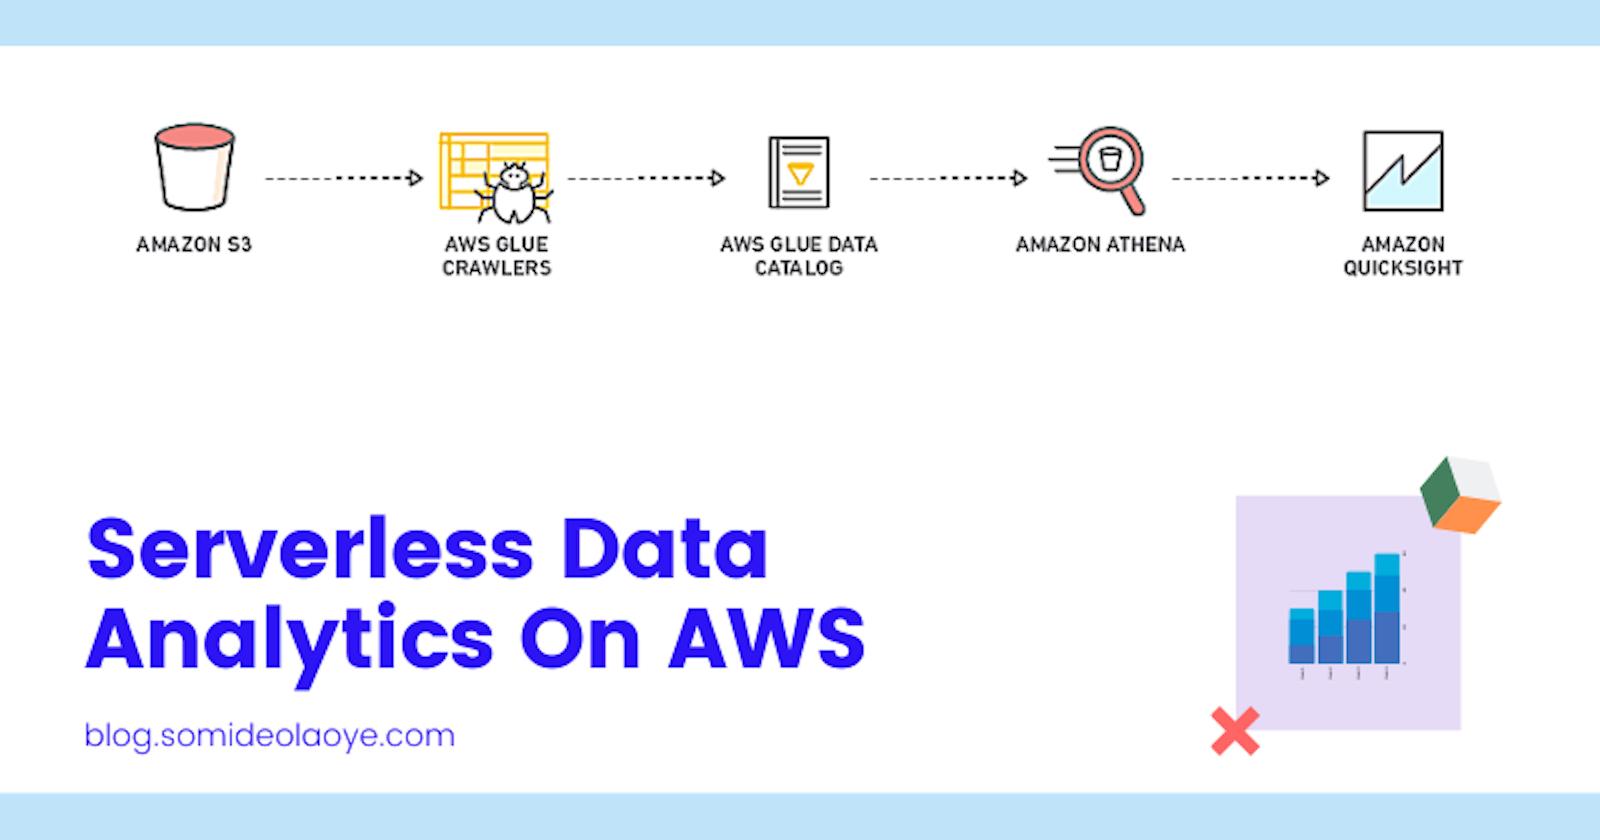 Serverless Data Analytics On AWS (QuickSight + Athena + Glue + S3).